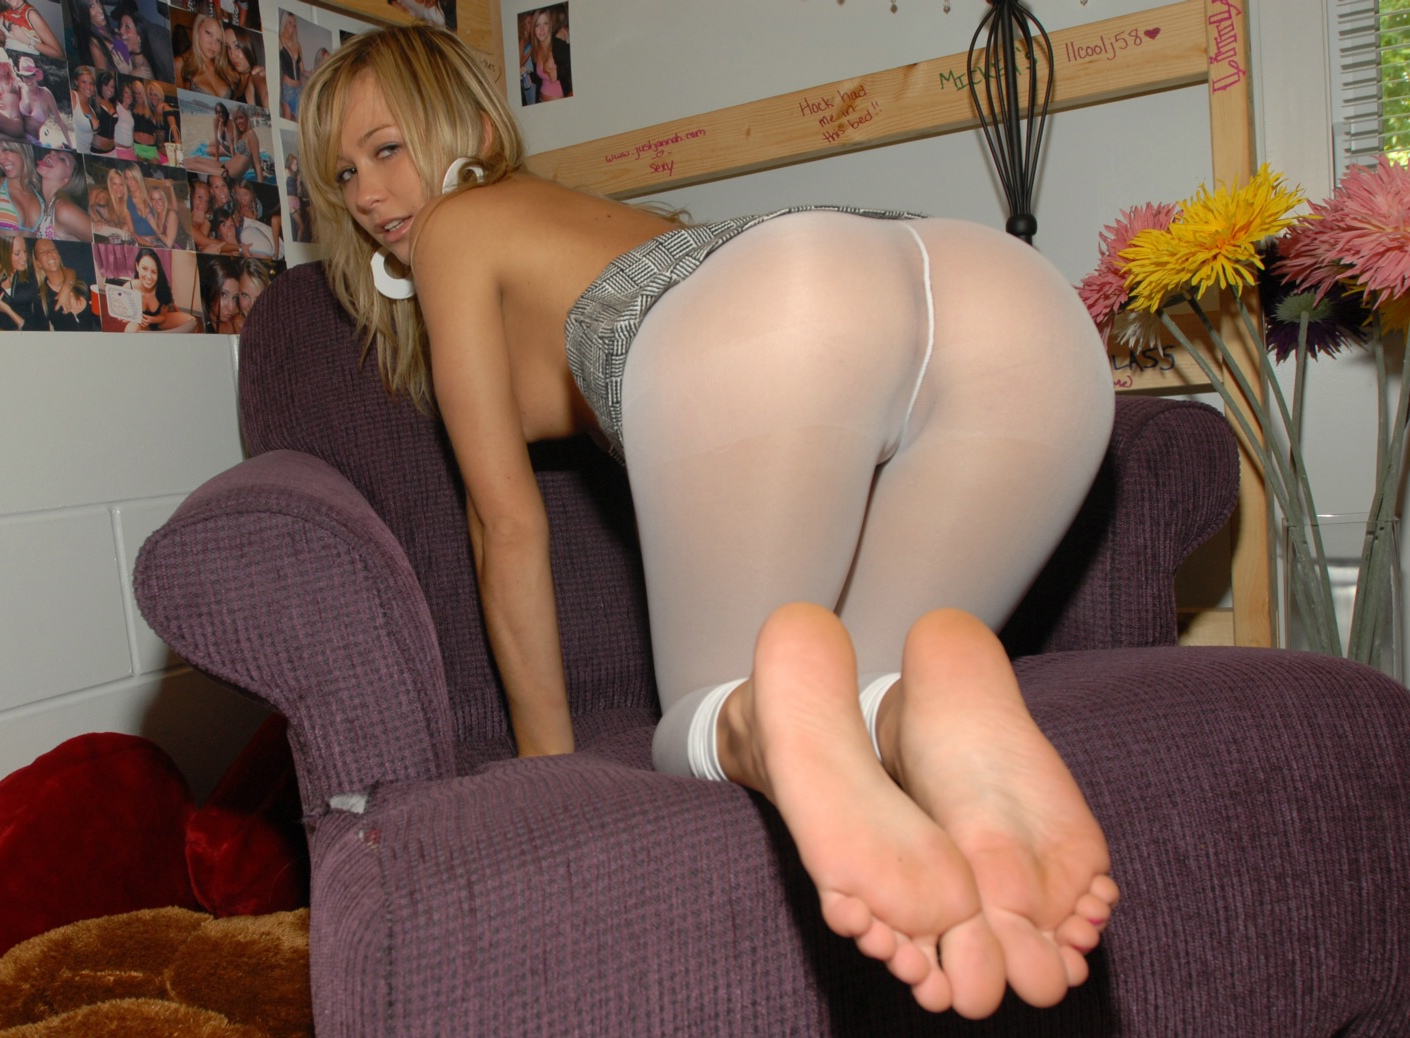 feet-fetish-nude-girls-foot-mix-vol5-50